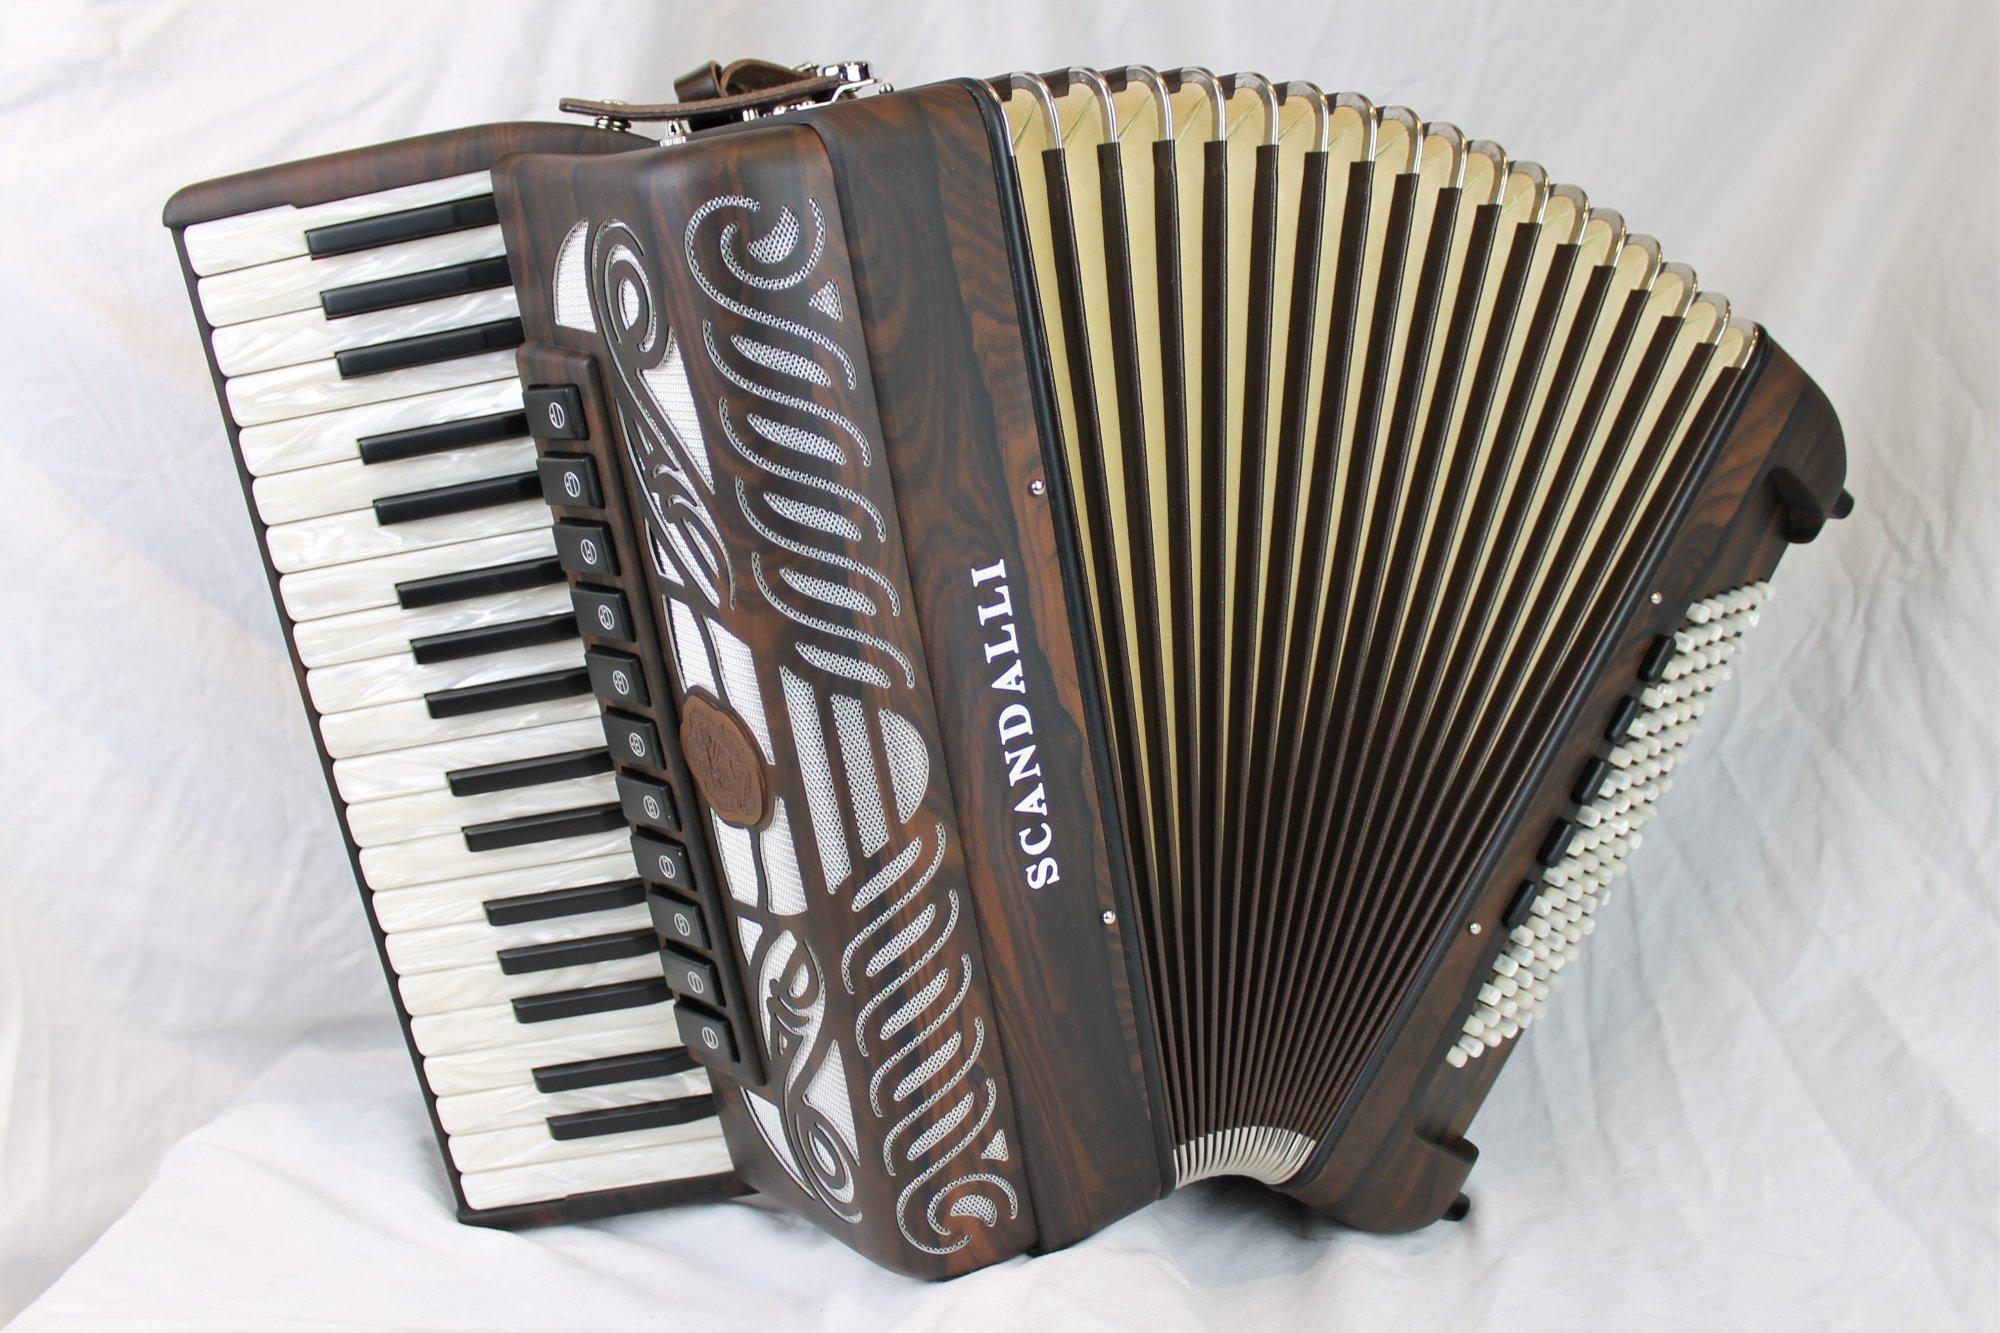 NEW Ziricote Wood Scandalli Tierra Piano Accordion LMMM 37 96